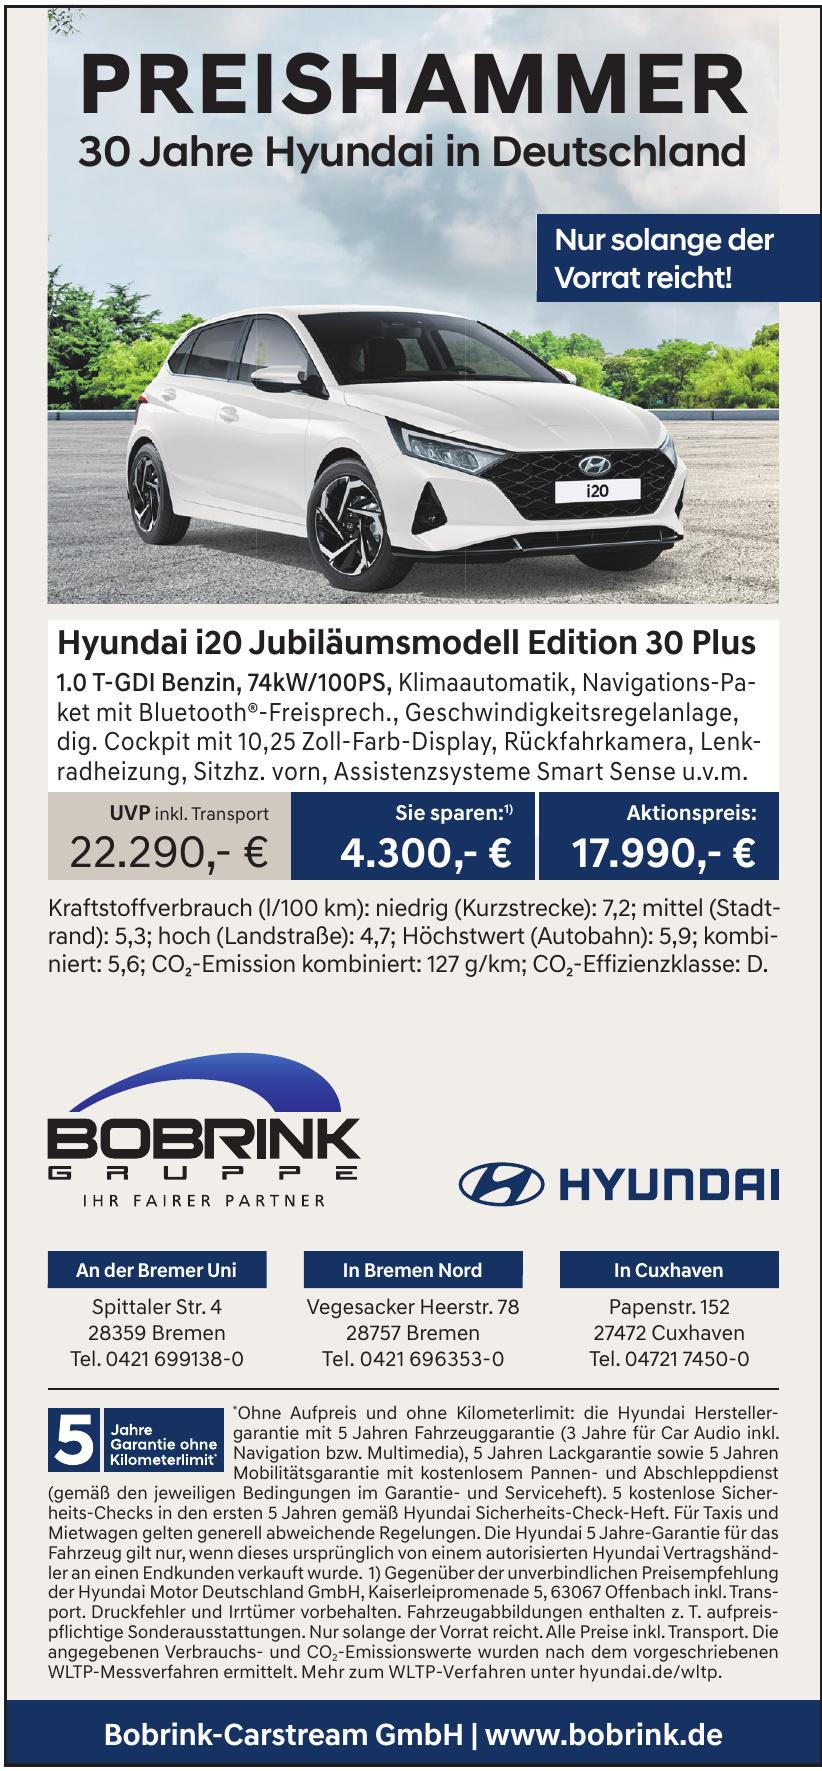 Bobrink-Carstream GmbH